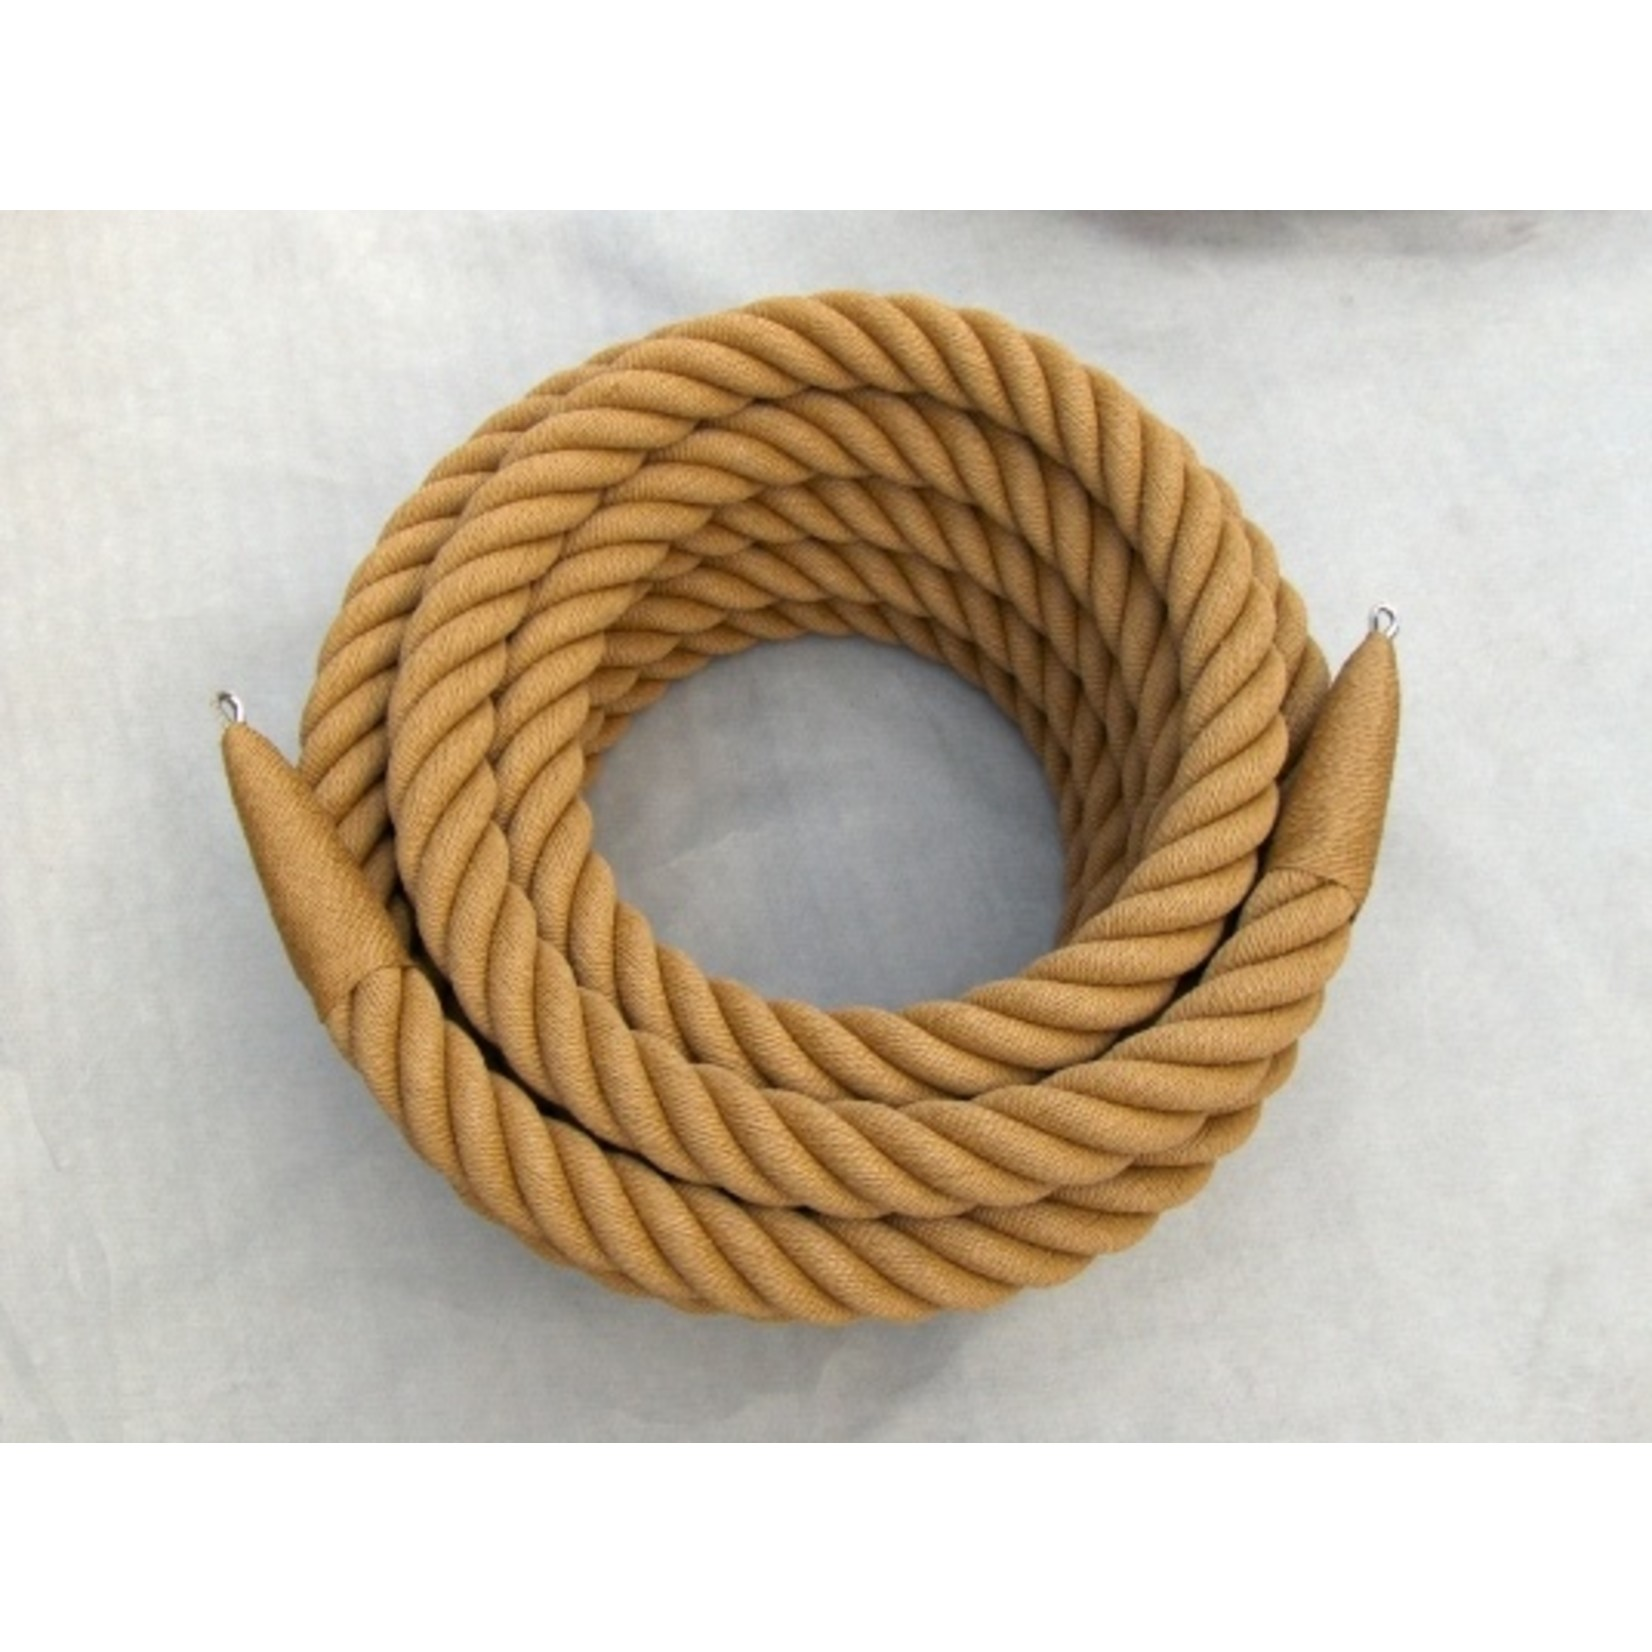 Fender Rope